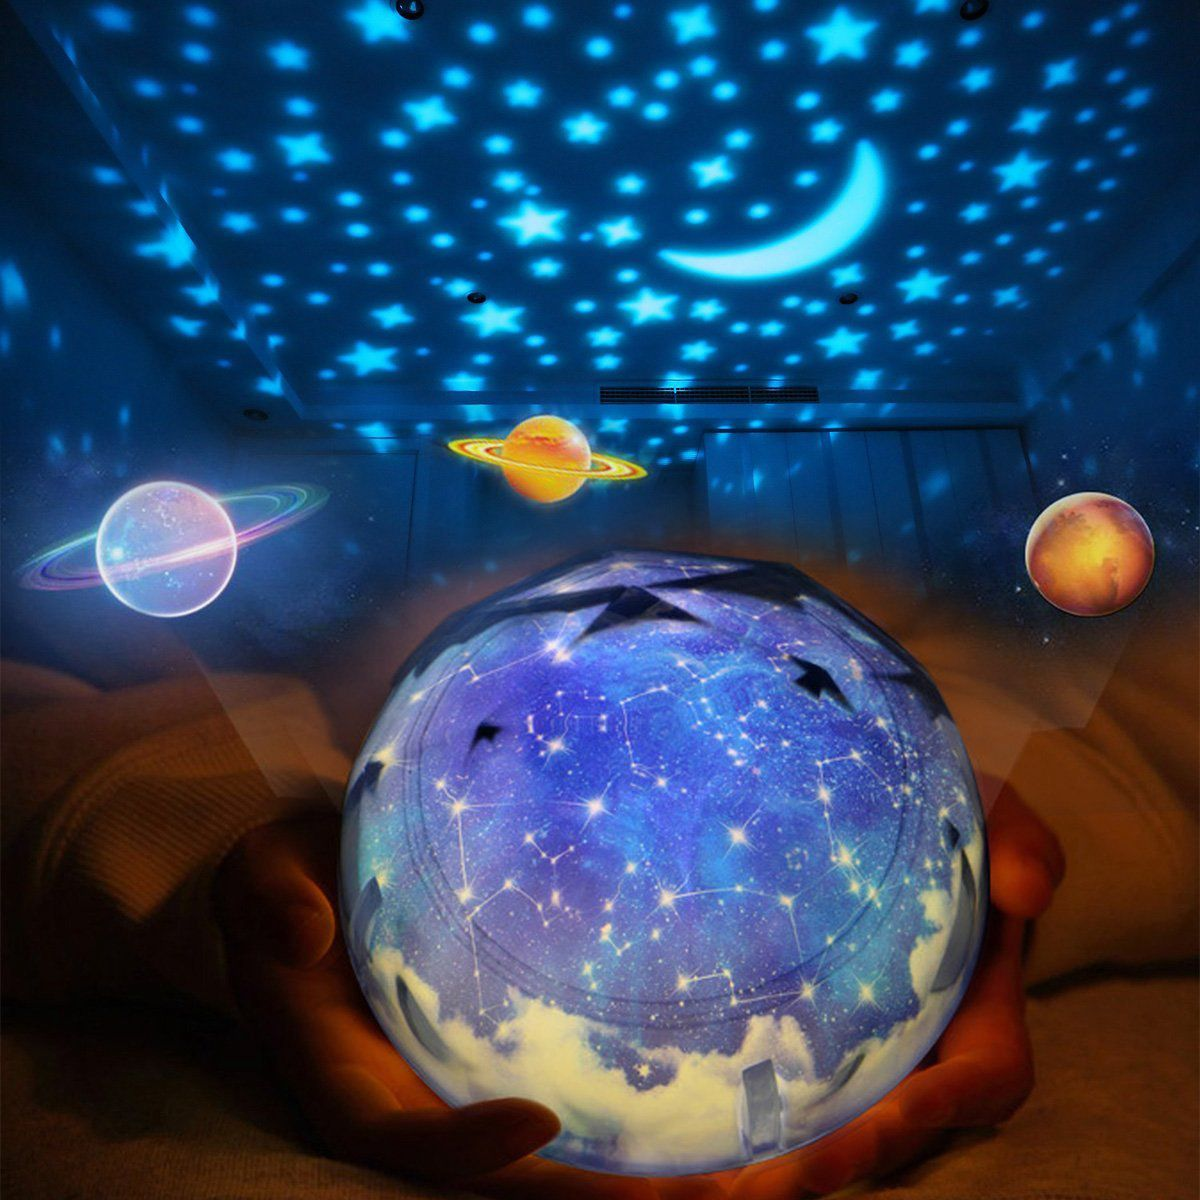 Star Night Lights for Kids Universe Cosmos Starry Sky Light LED Projector Rotating Lamp Nightlight Moon Sea World Decorative(China)